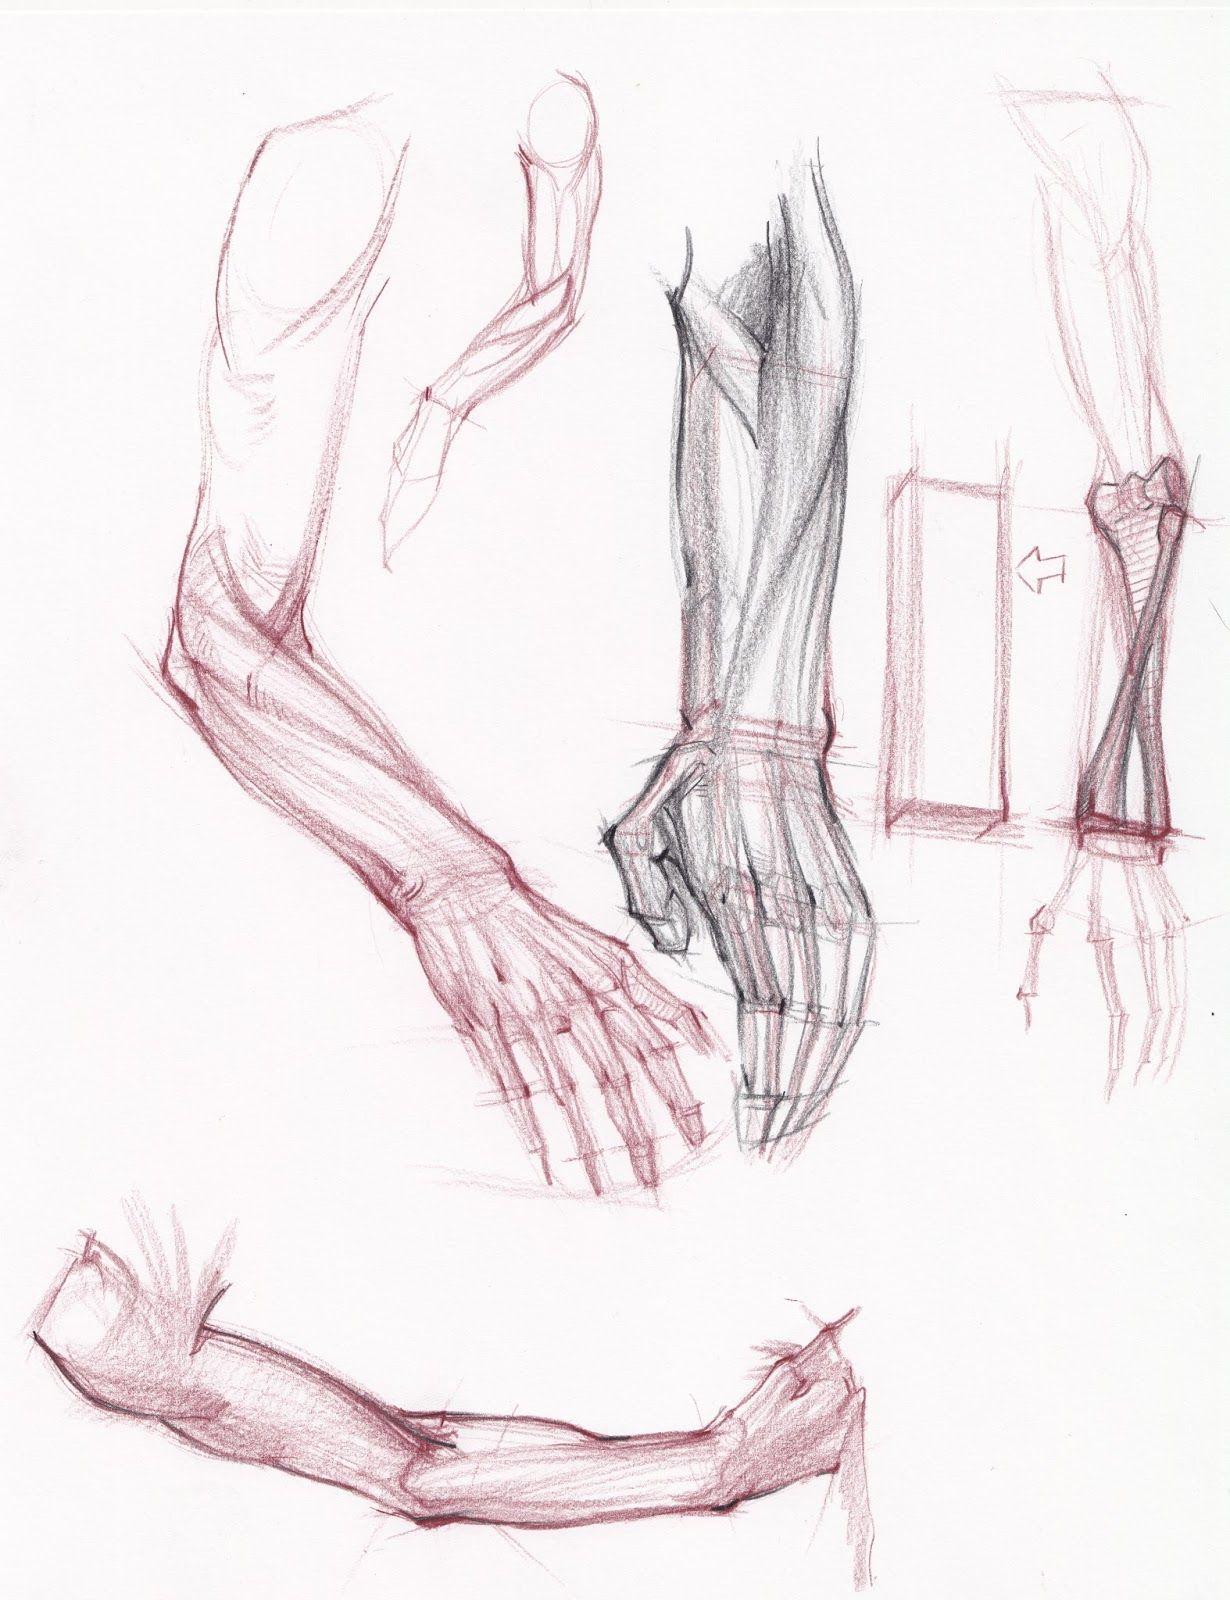 Pin de My Ng en anatomy - body   Pinterest   Anatomía, Ilustración ...